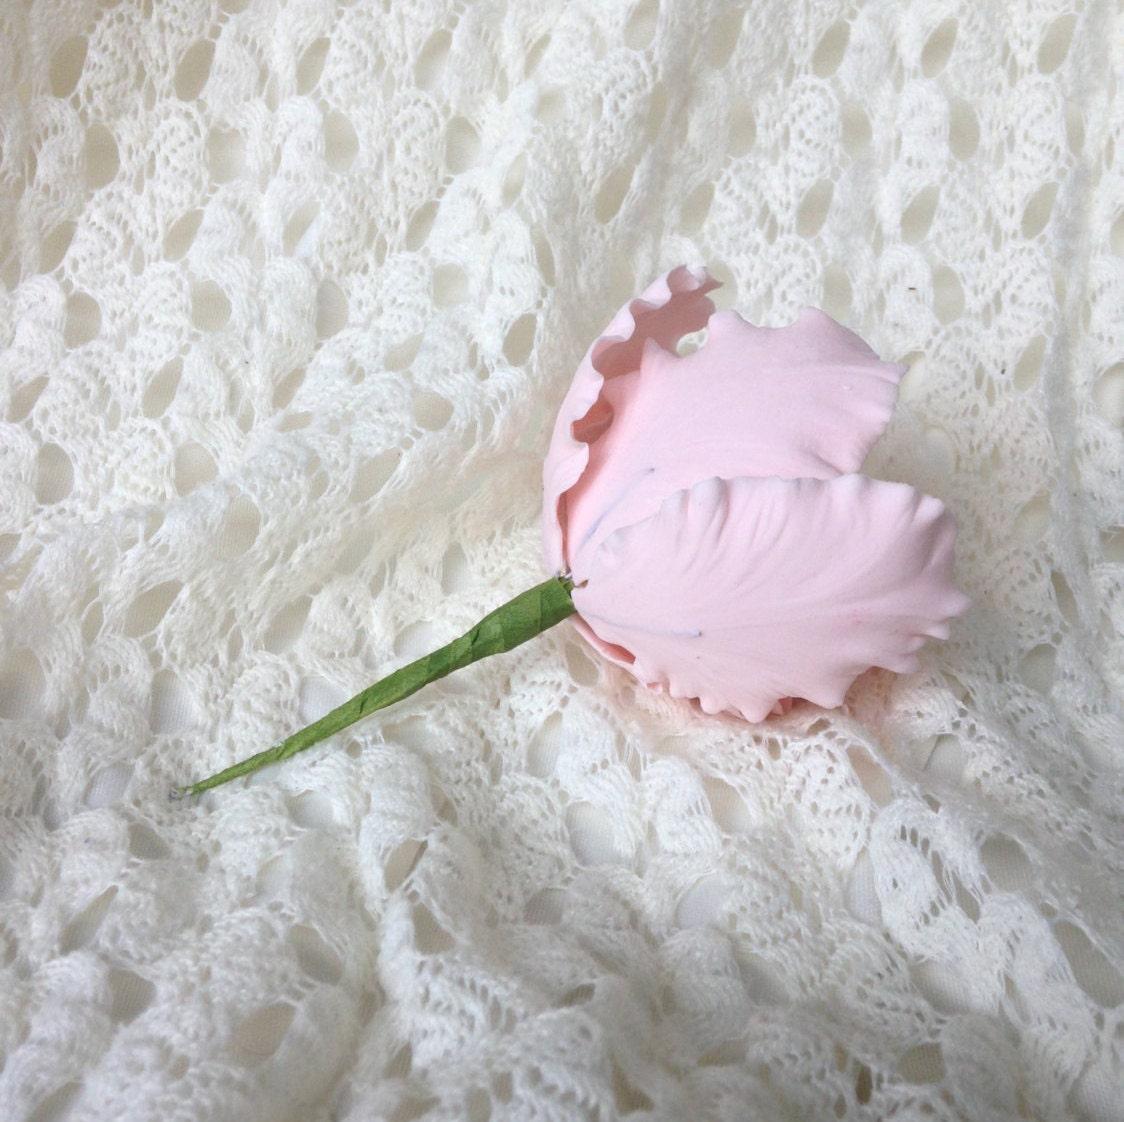 Parrot tulip blush pink sugar flower for wedding cakes gumpaste gallery photo gallery photo gallery photo mightylinksfo